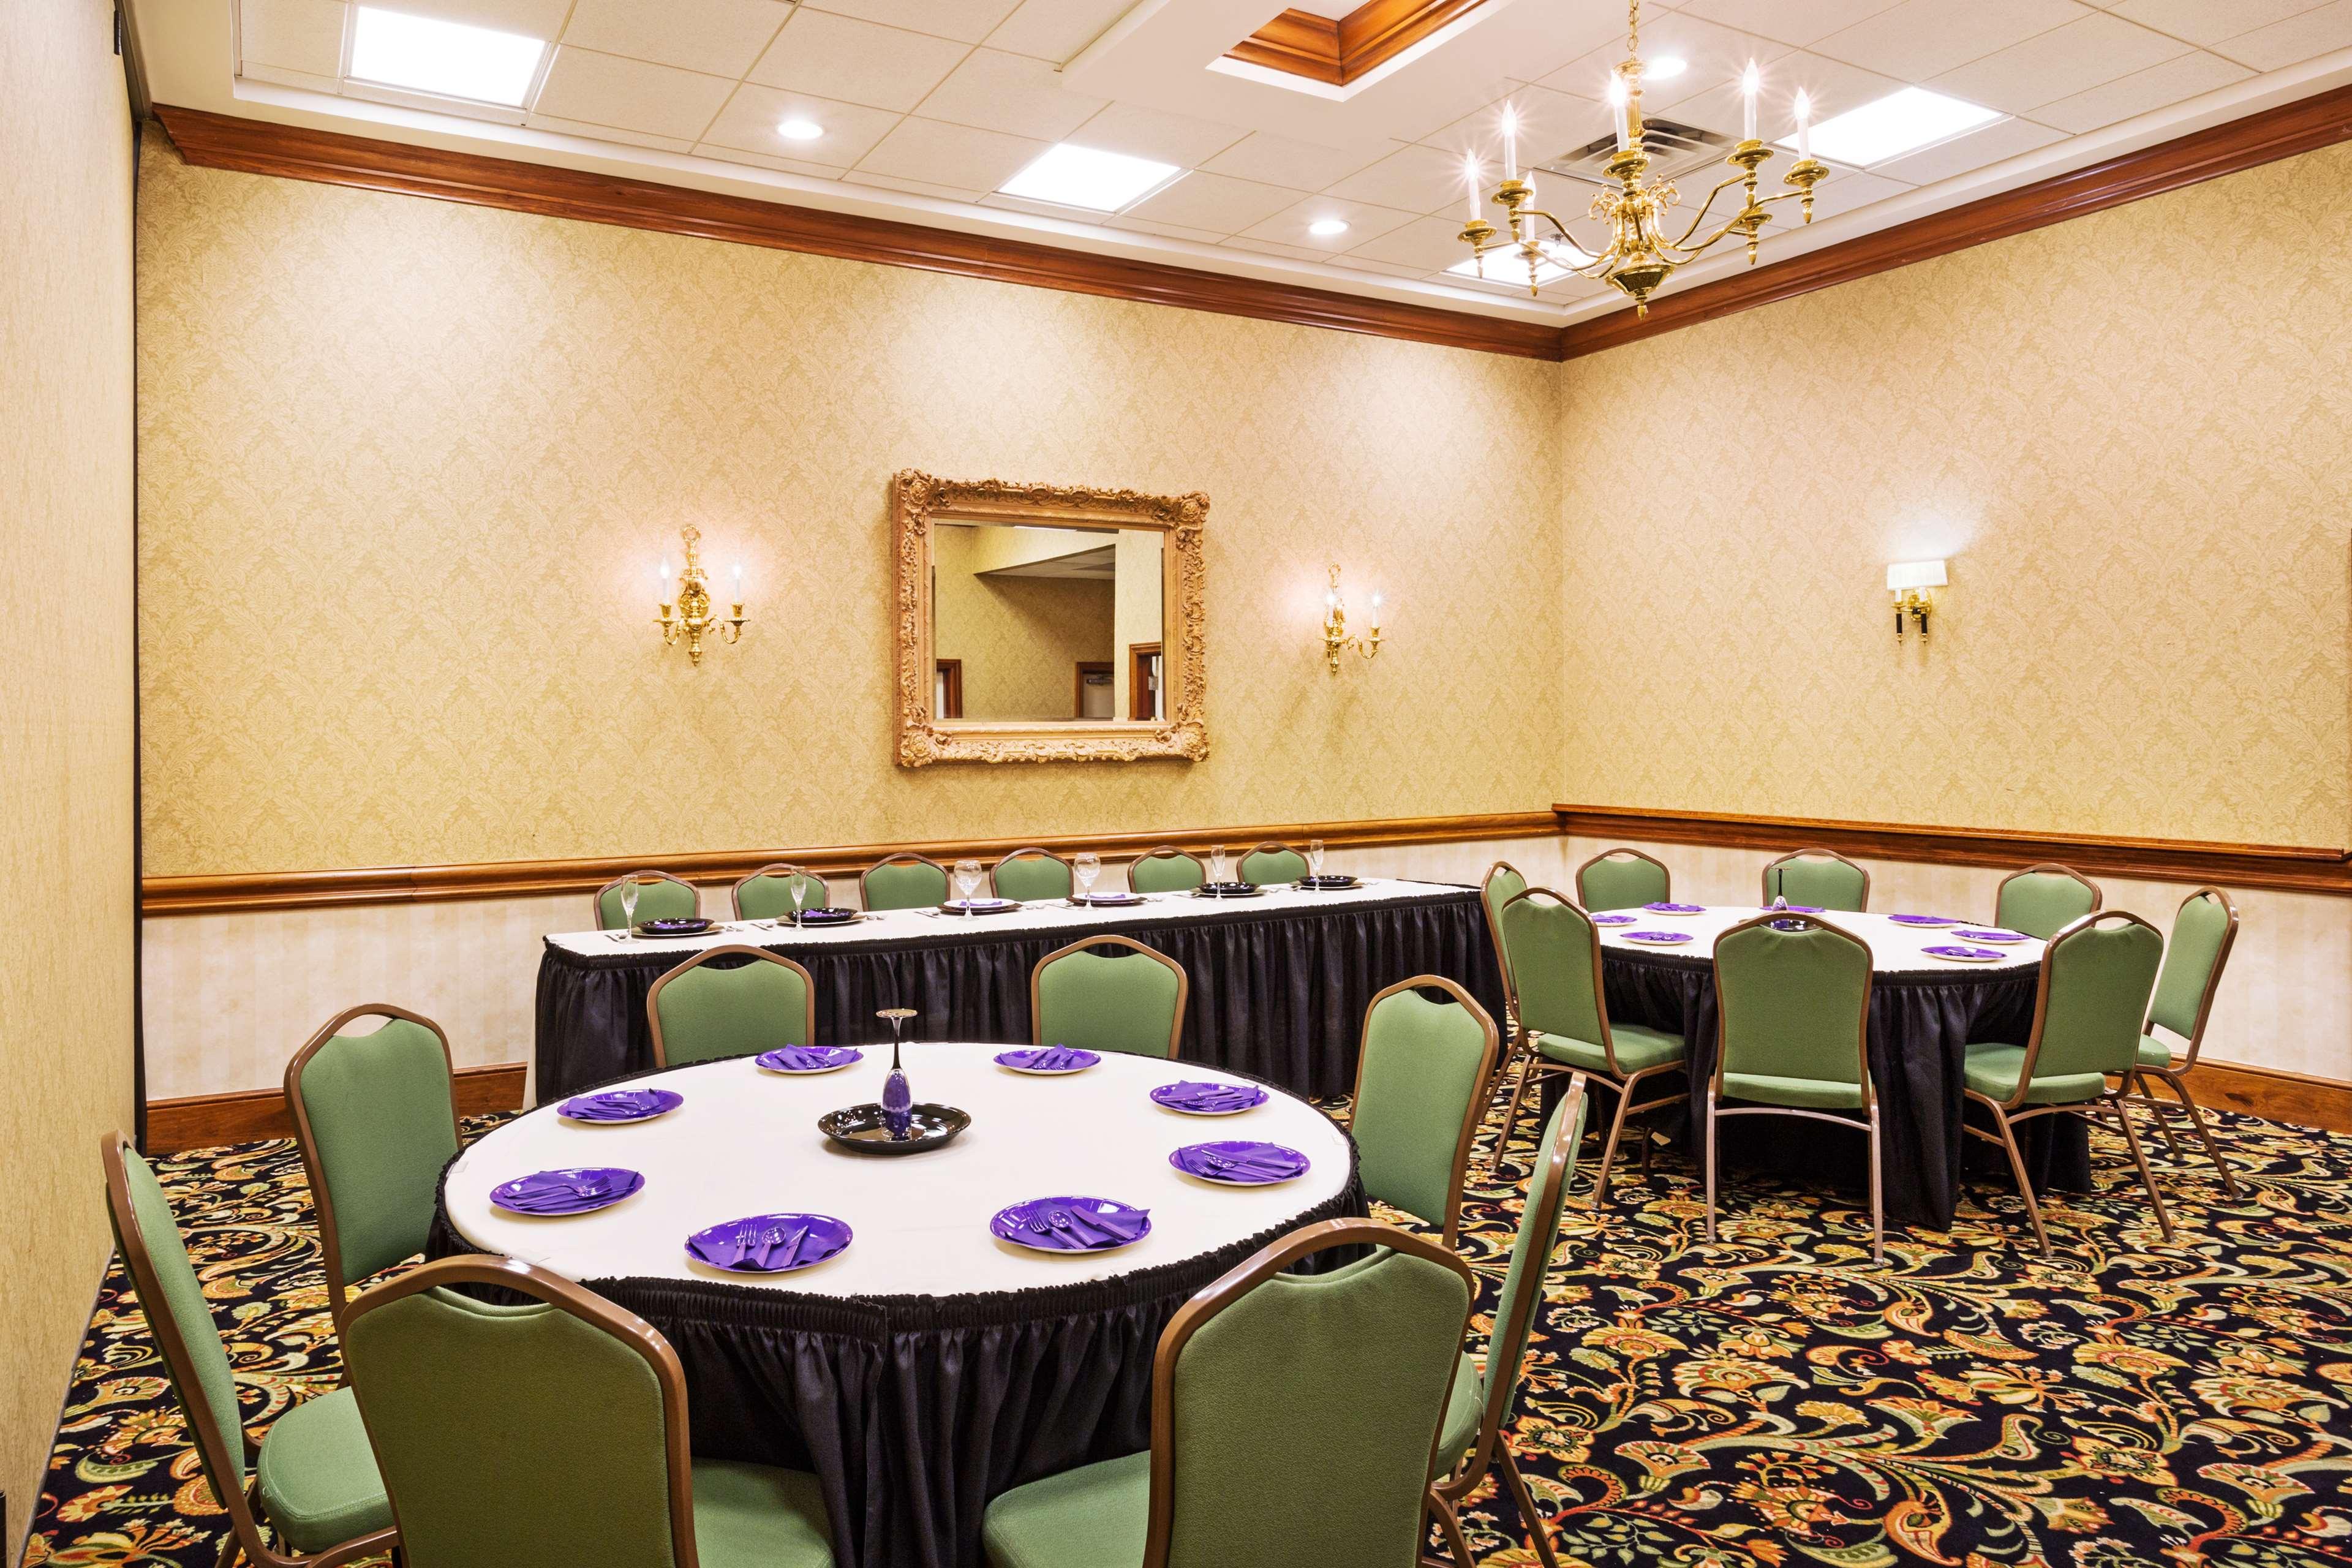 Hampton Inn & Suites Greenville/Spartanburg I-85 image 45